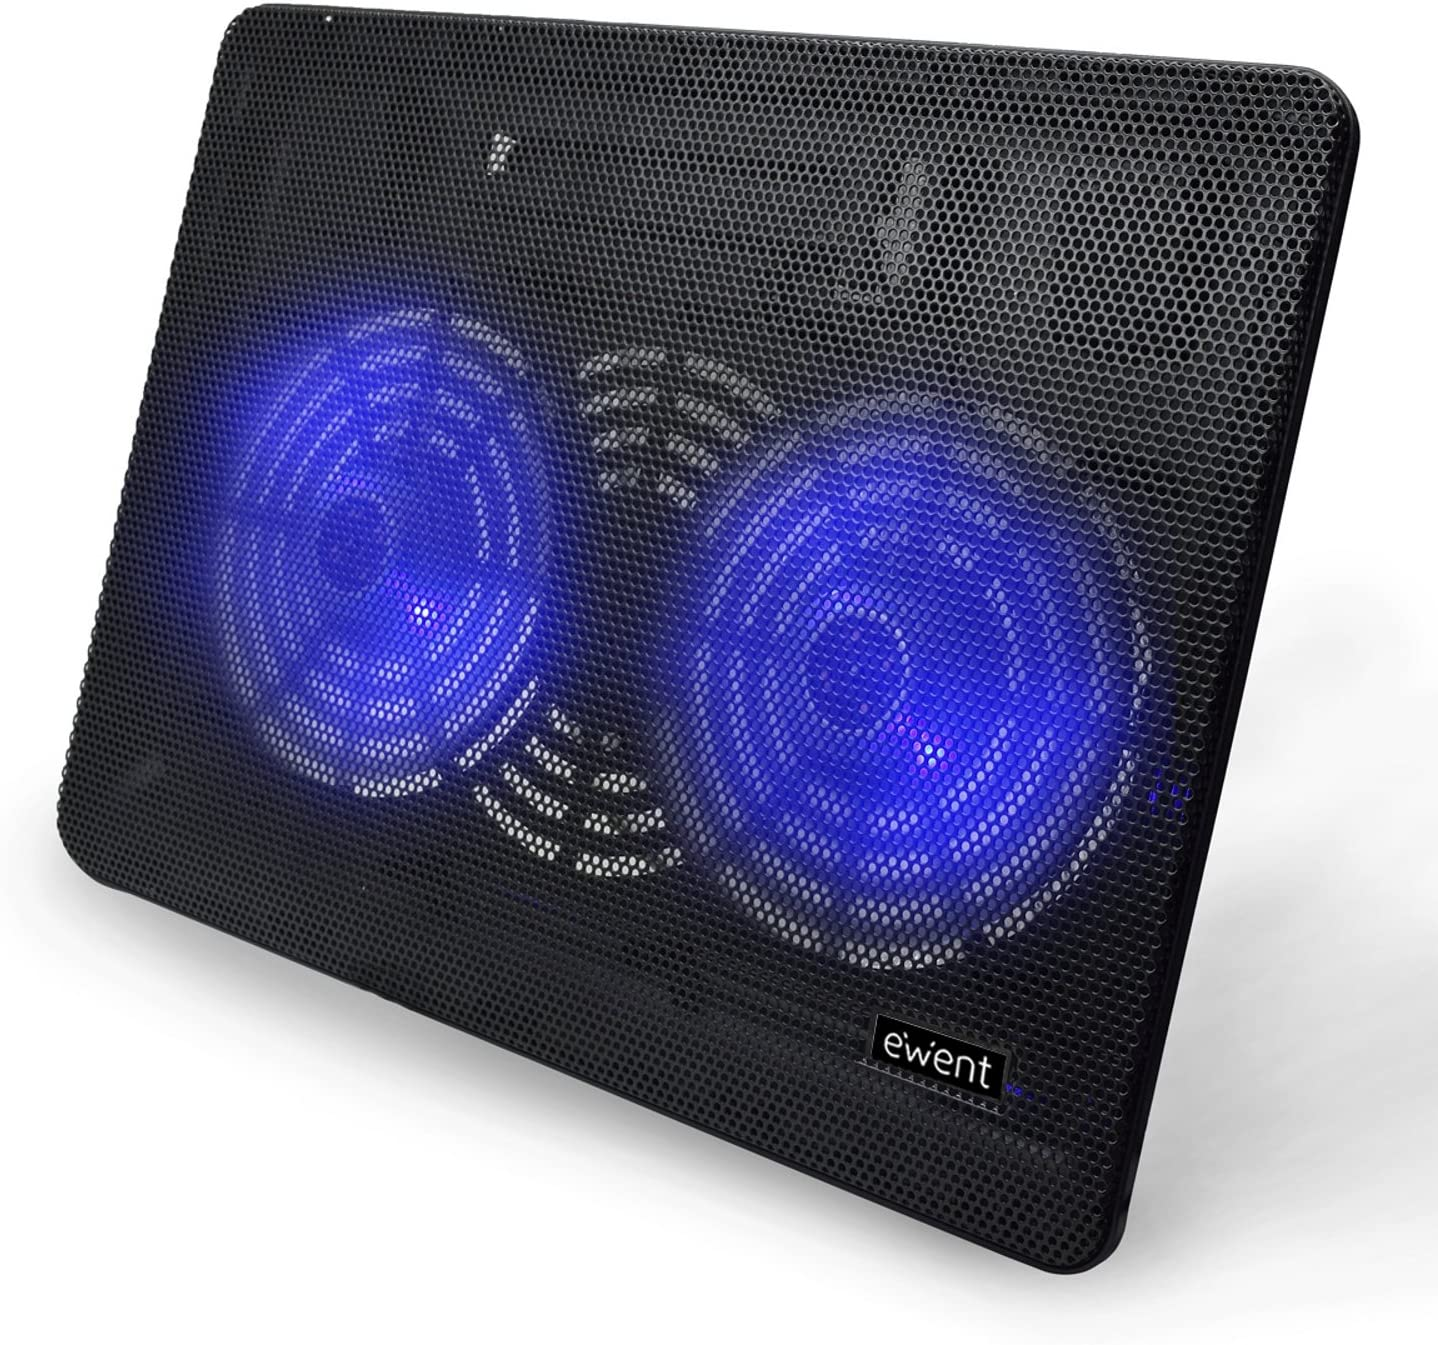 Ewent EW1256 Base de refrigeración para ordenador portátil de 12 a 17 pulgadas, 2 ventiladores, luz LED azul, color negro